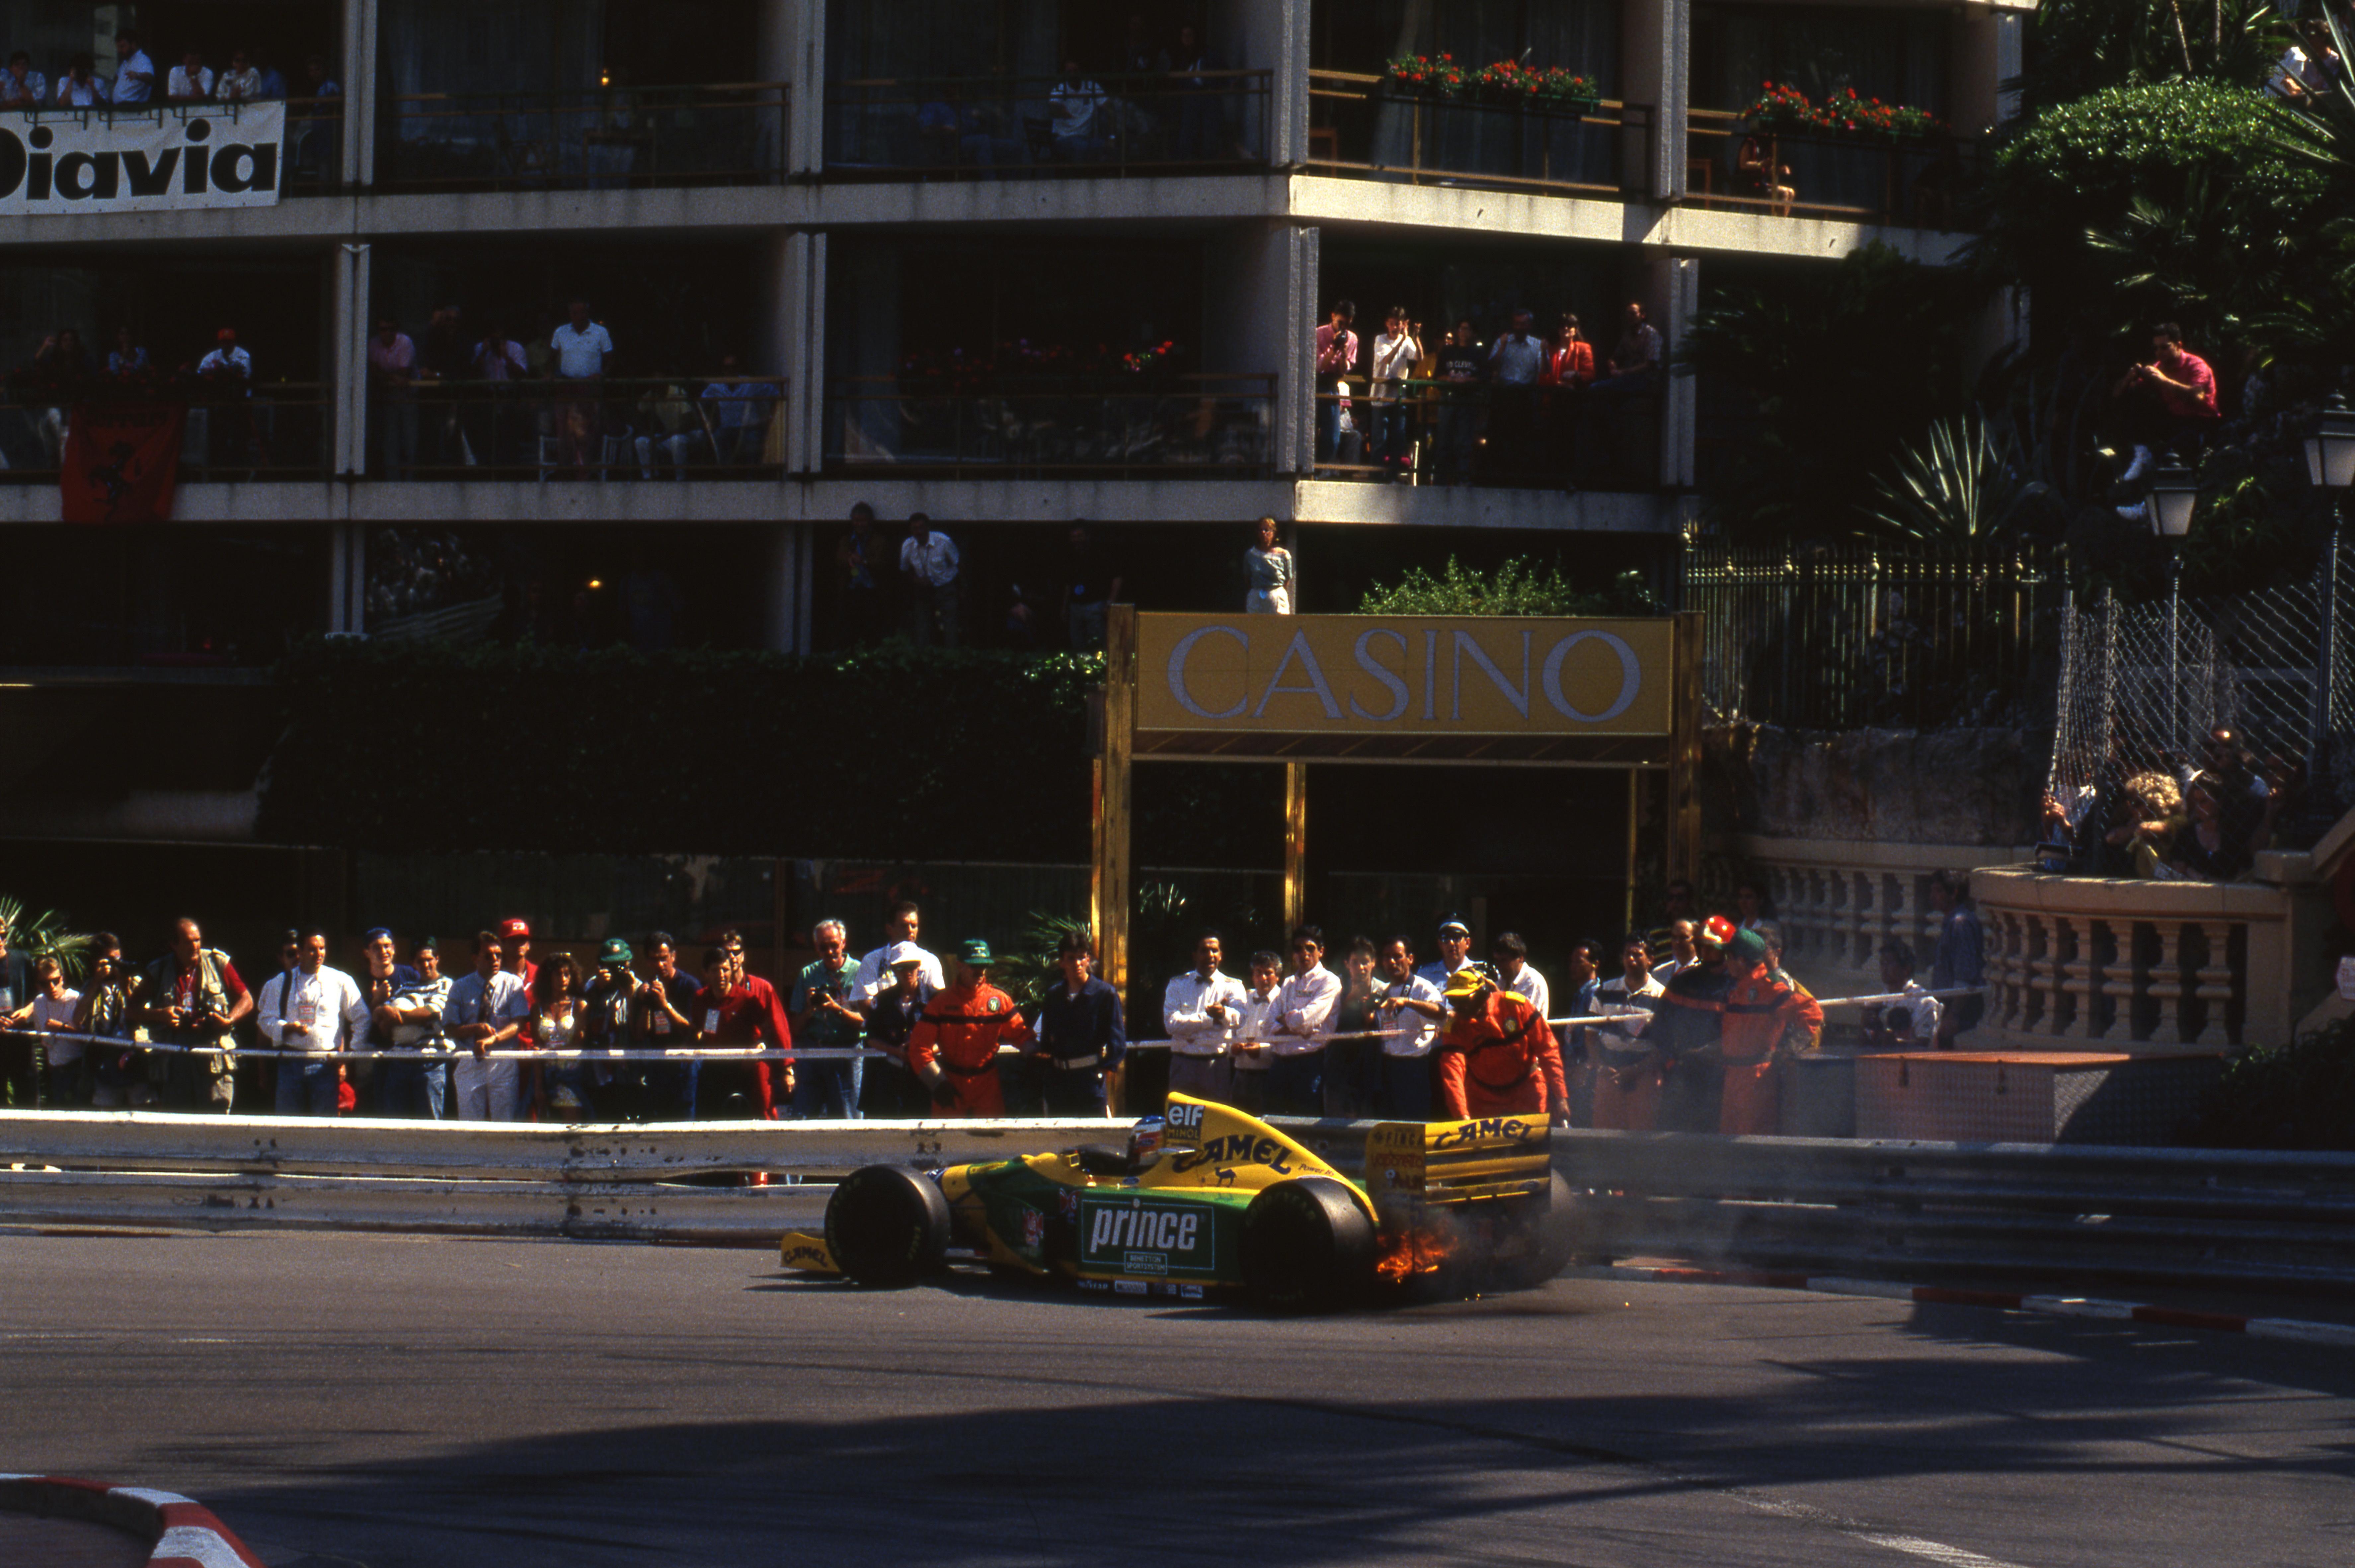 Michael Schumacher retires from 1993 Monaco GP Benetton F1